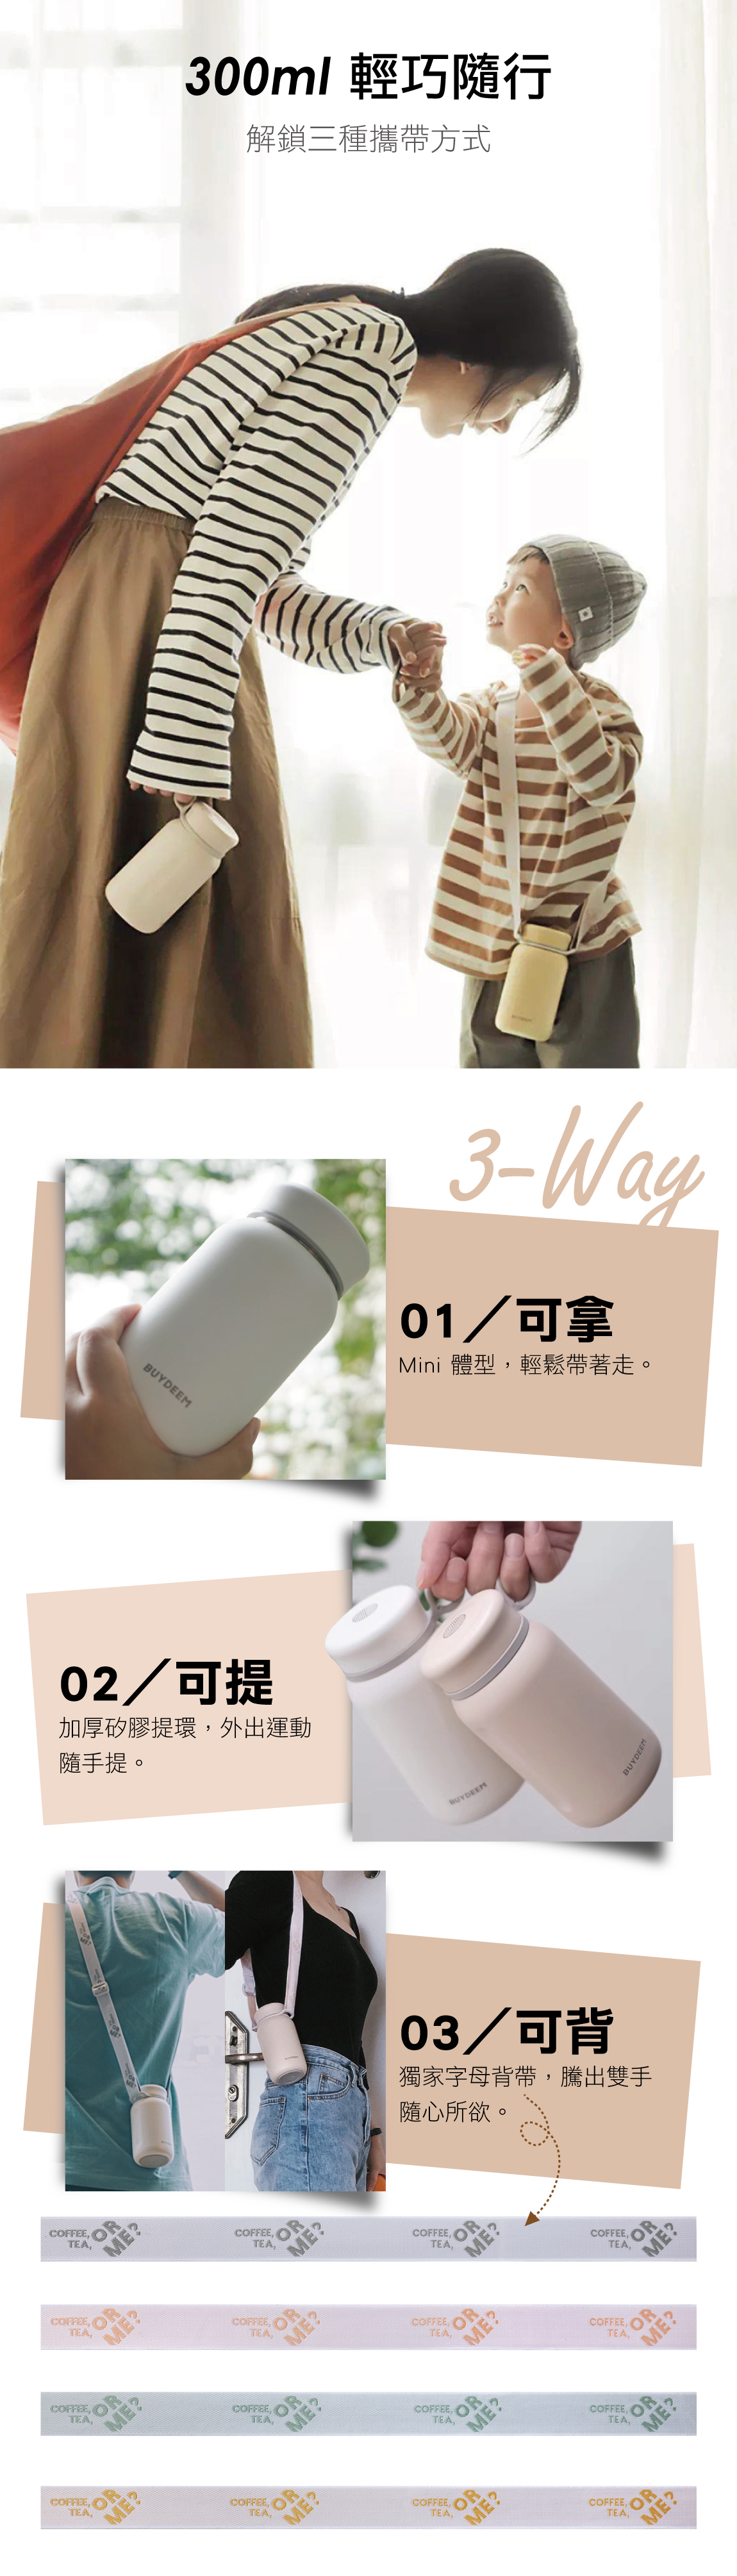 My-Way輕巧保溫杯-3種攜帶方式-BUYDEEM北鼎-iF設計大獎